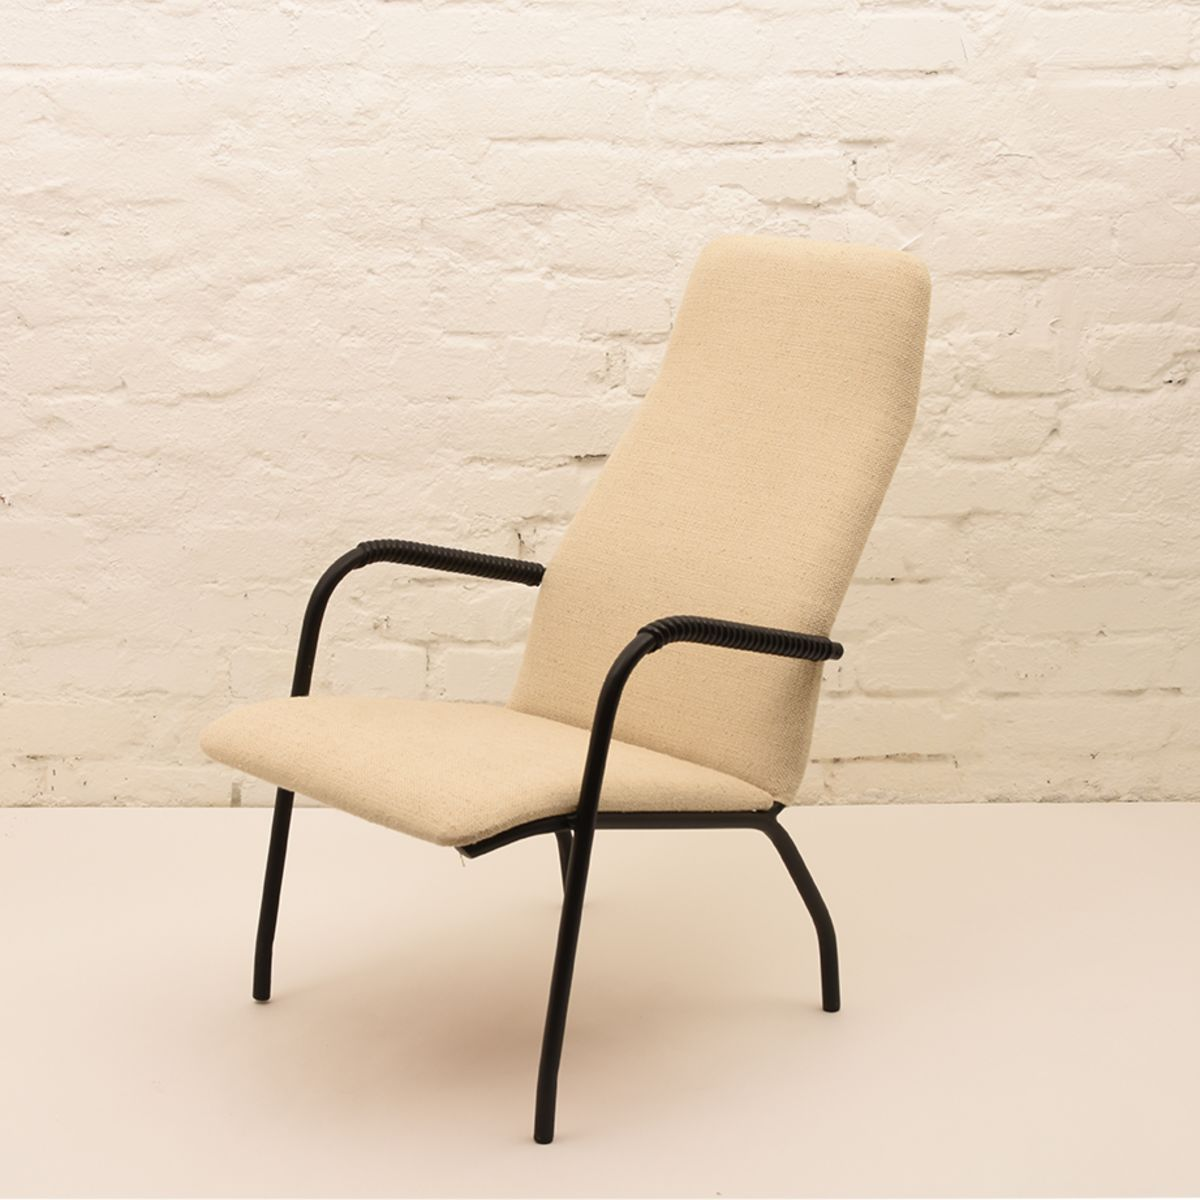 Painted-Tubular-Steel-Chair